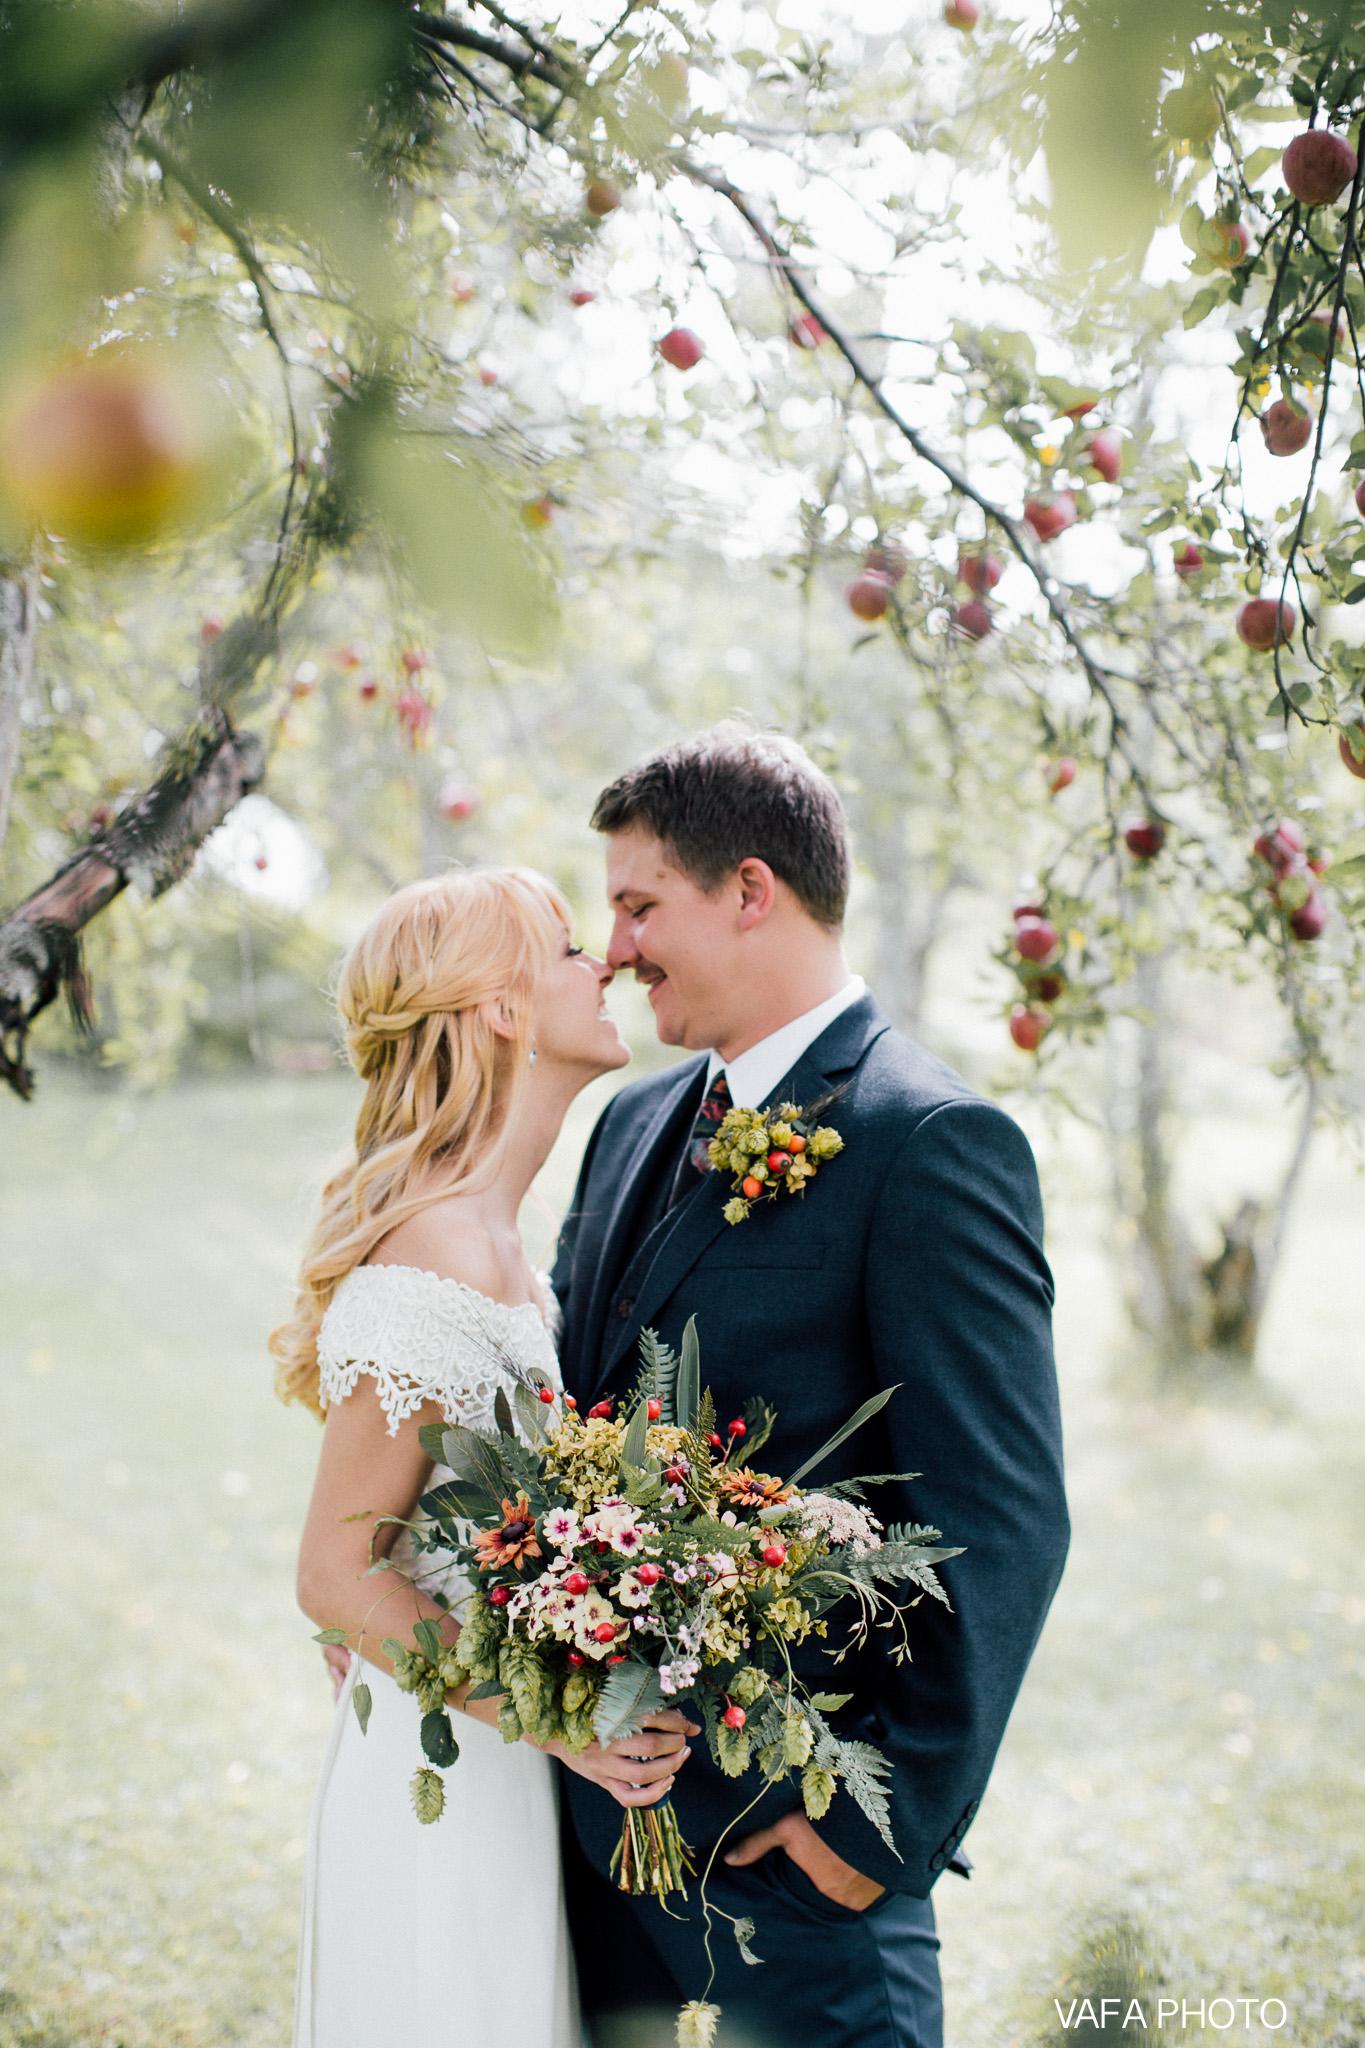 Belsolda-Farm-Wedding-Christy-Eric-Vafa-Photo-76.jpg